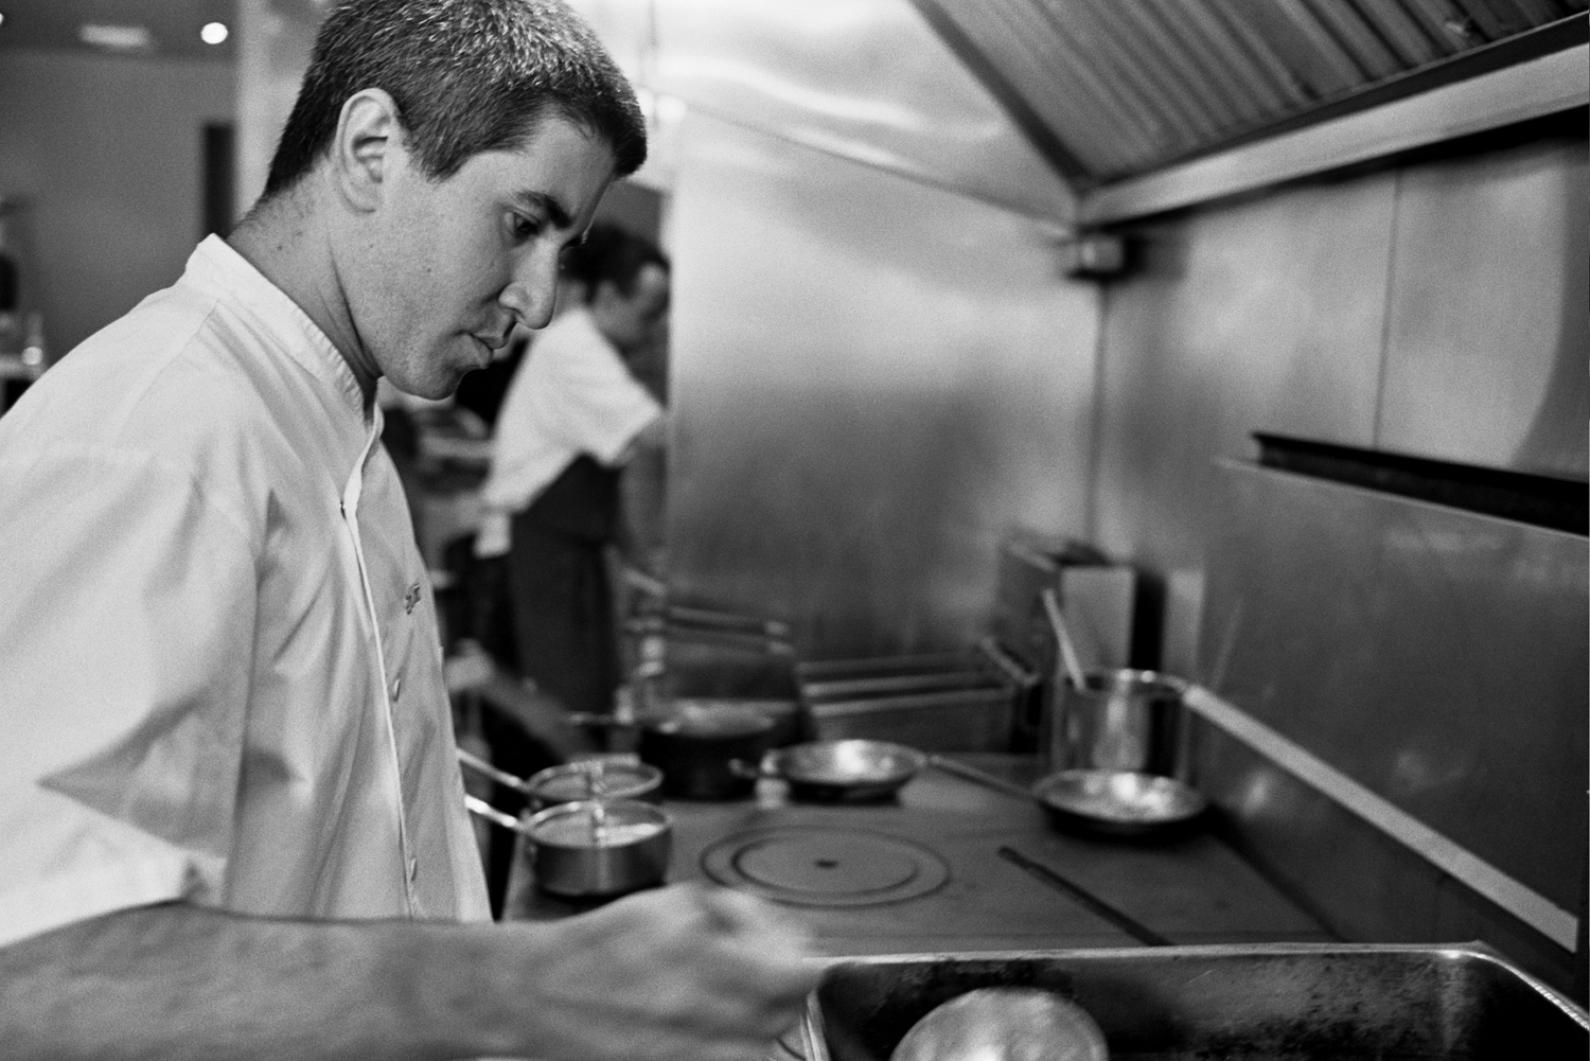 Chef Michael Solomonov at Zahav. Photo by Mike Regan